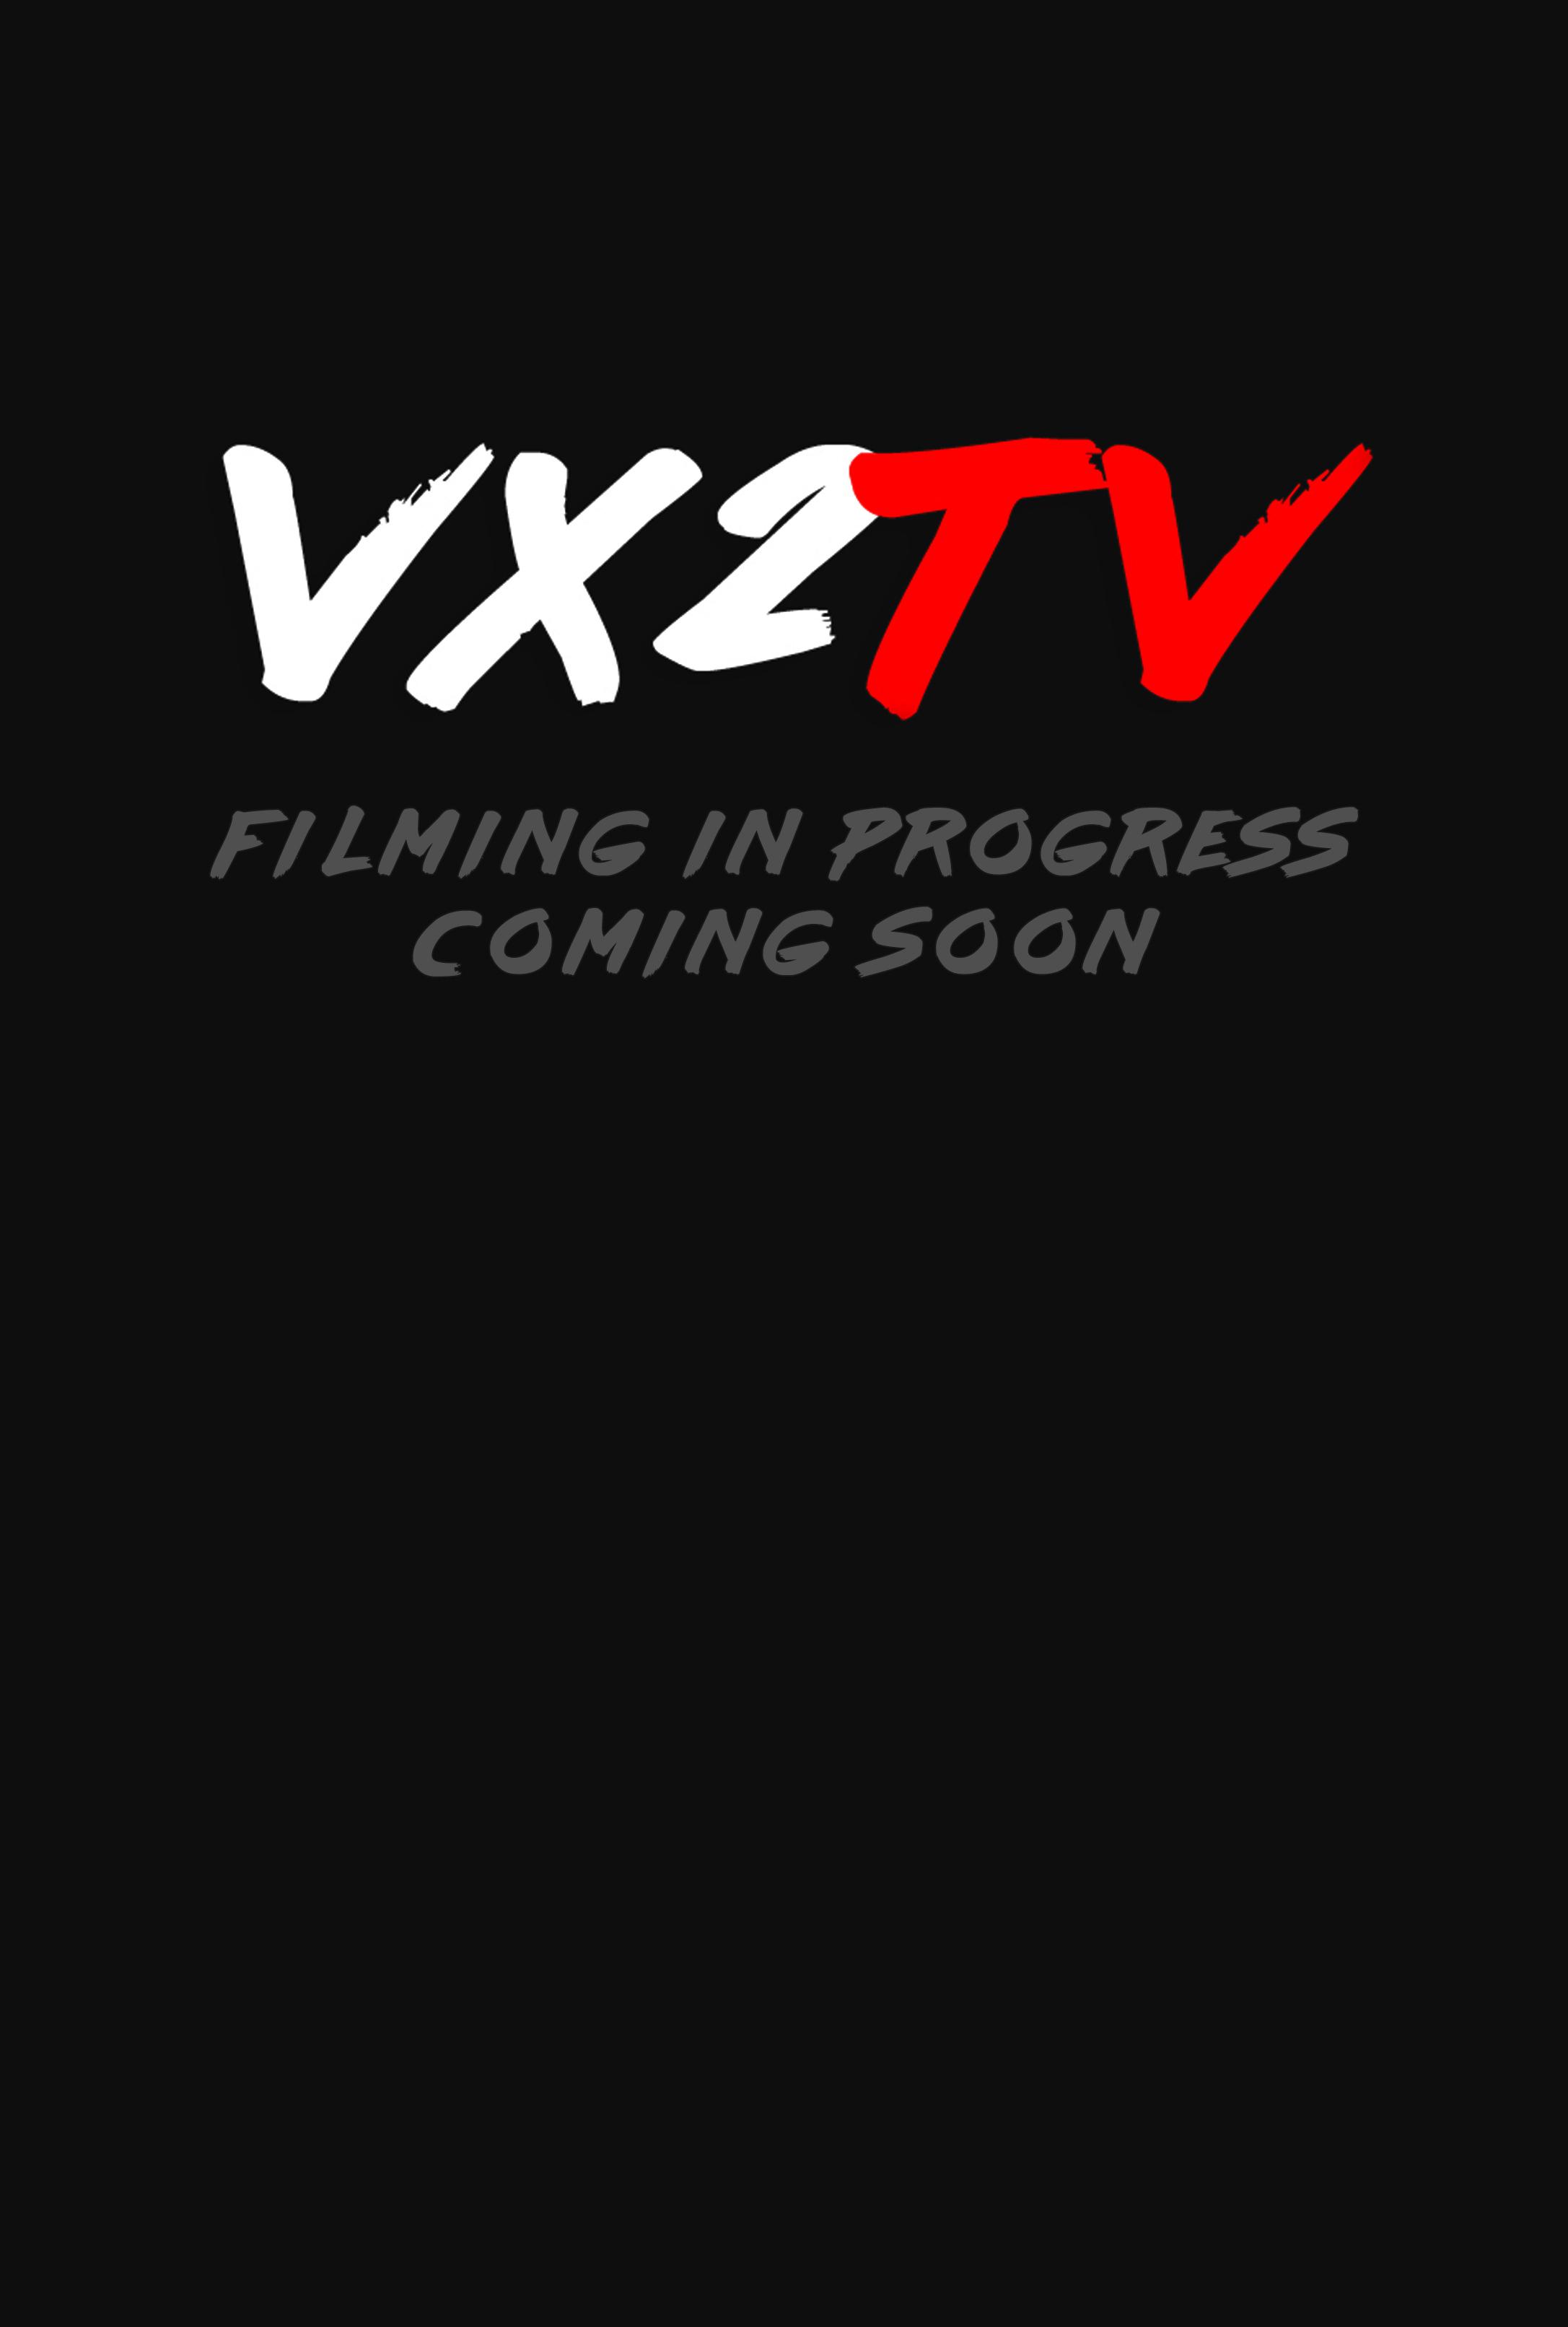 VX2TV Coming Soon.jpg